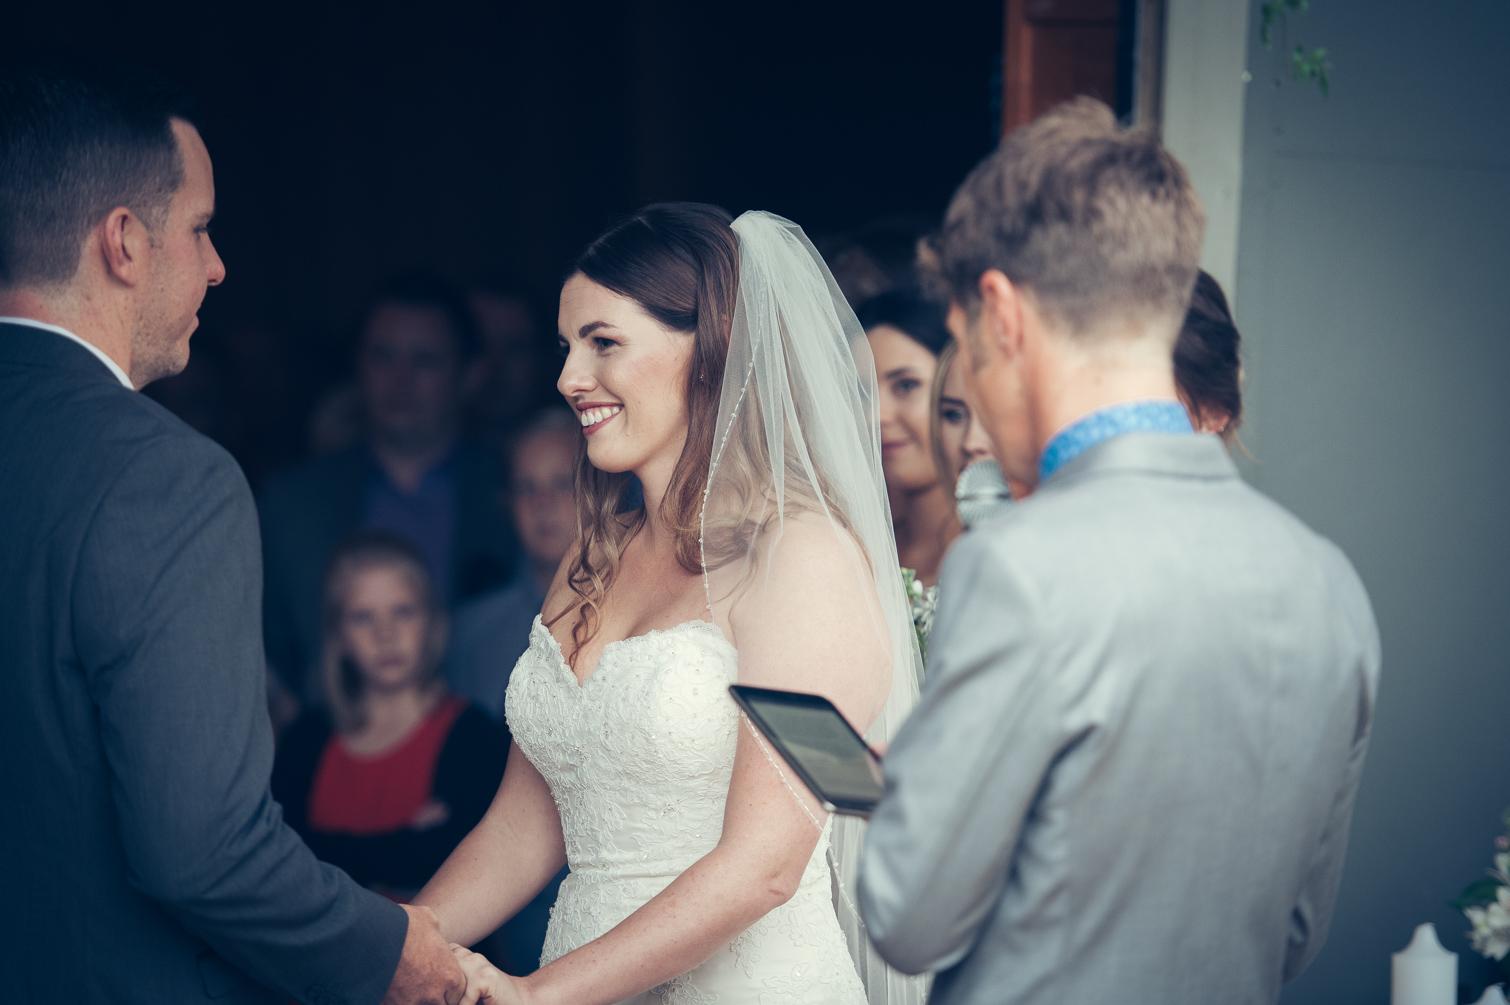 Kingscliffe_male_wedding_celebrant-Benjamin_Carlyle -9.jpg